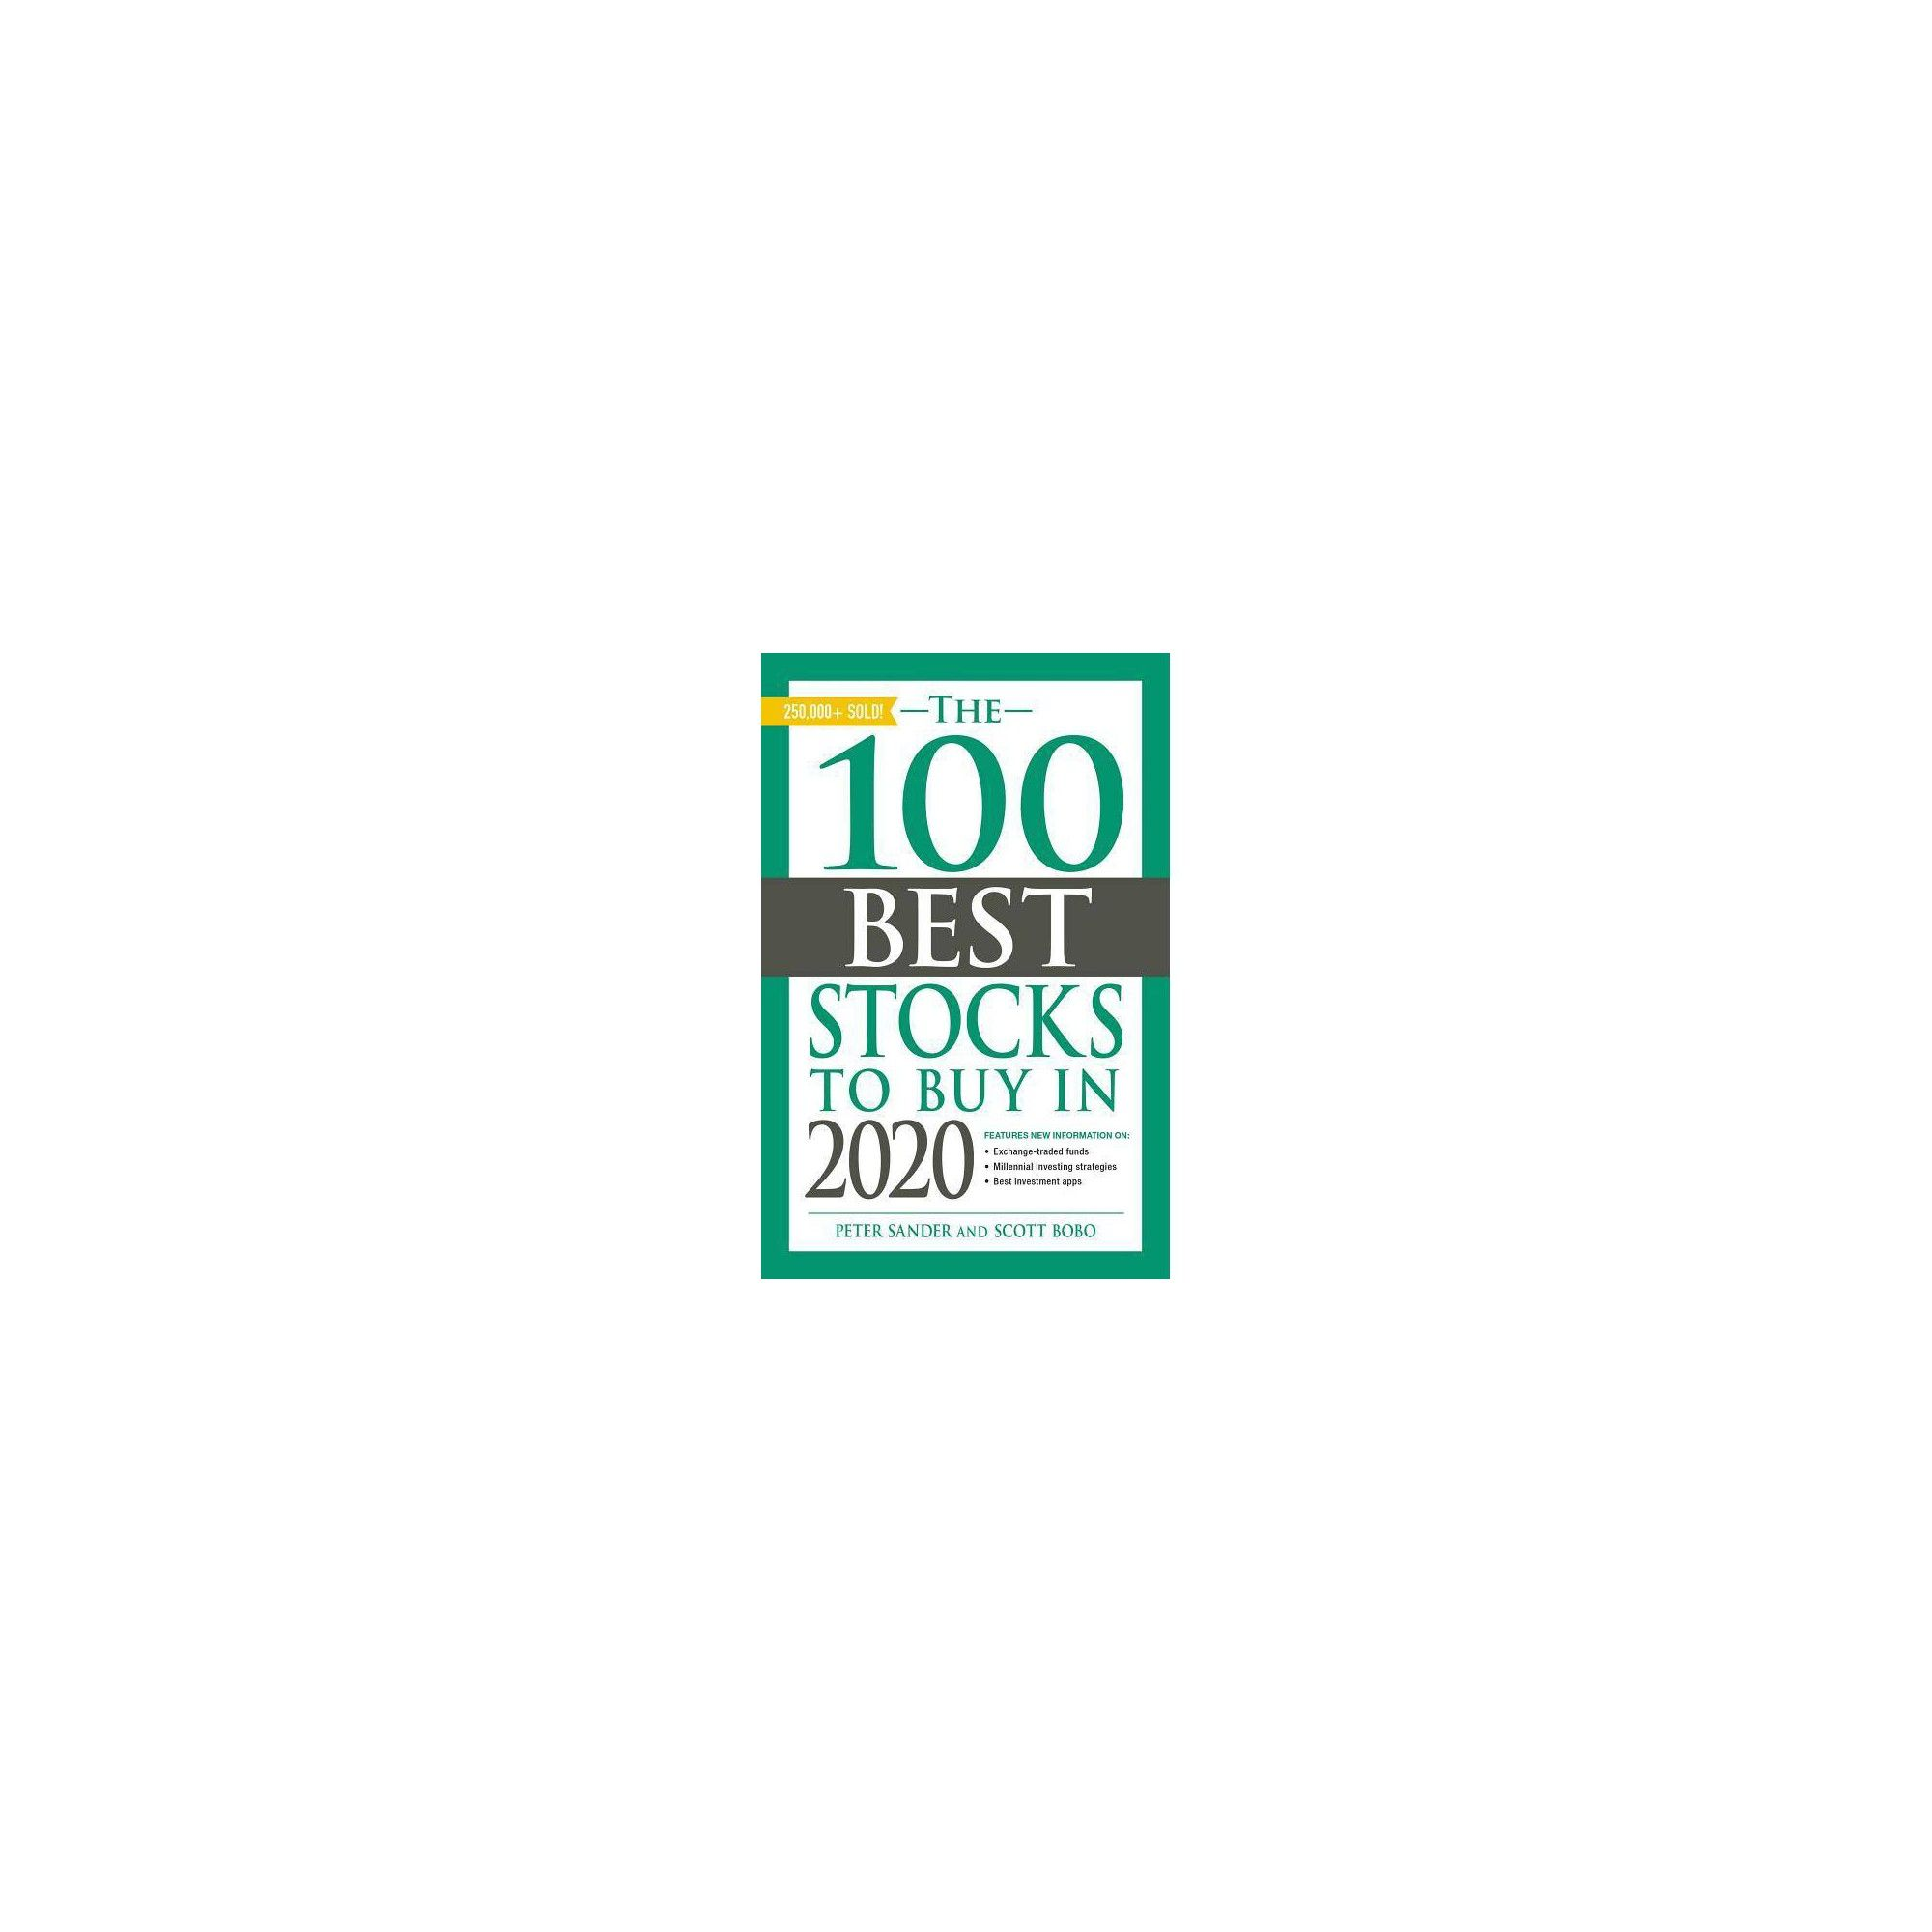 Best Stock For 2020.The 100 Best Stocks To Buy In 2020 By Scott Bobo